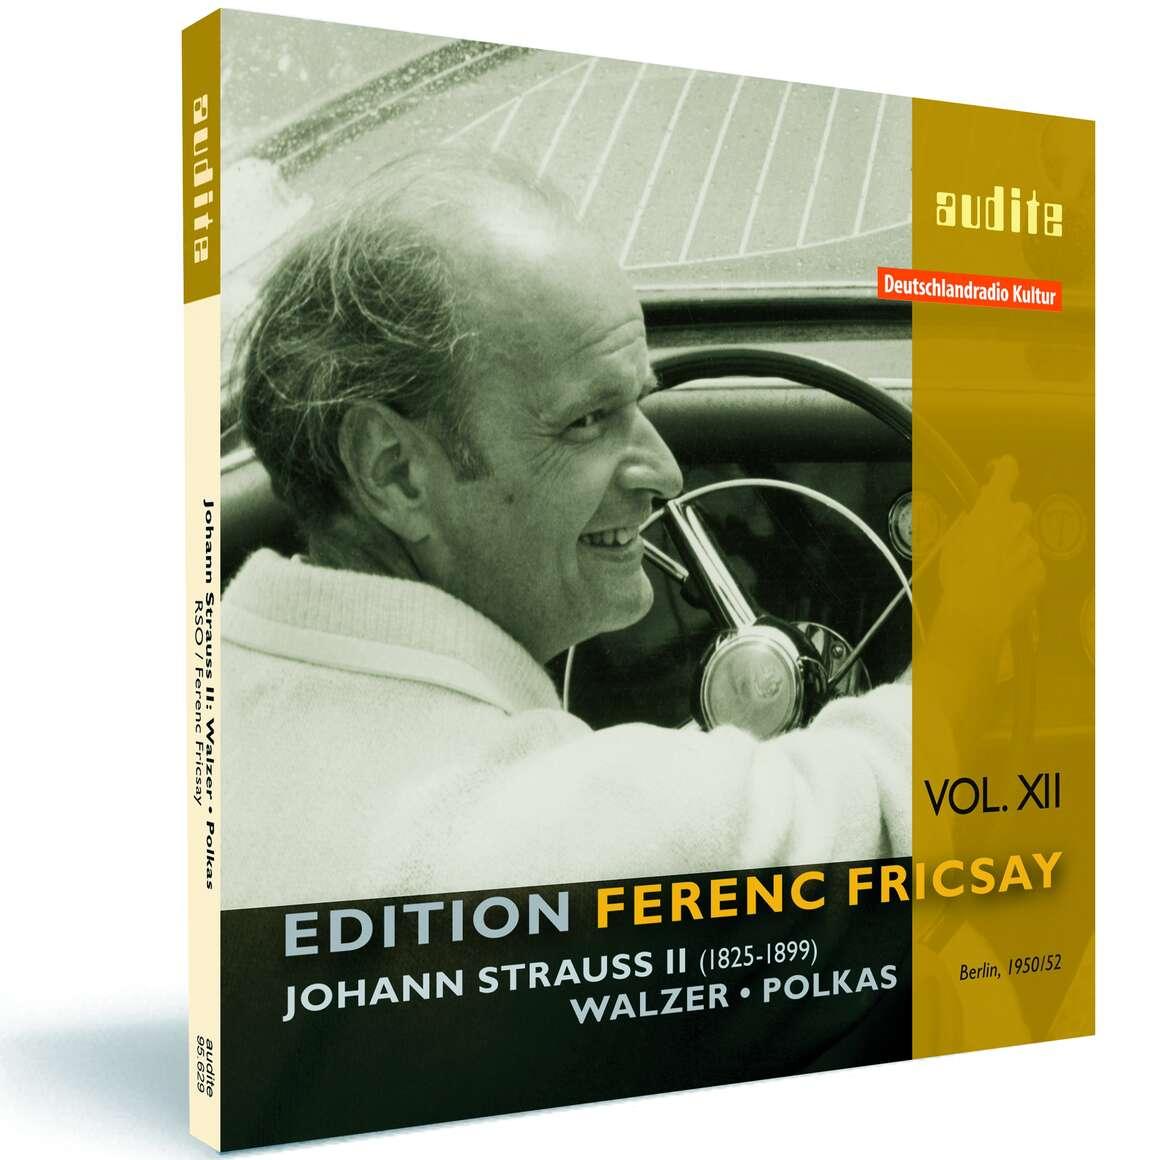 Edition Ferenc Fricsay (XII) – J. Strauss: Walzer • Polkas